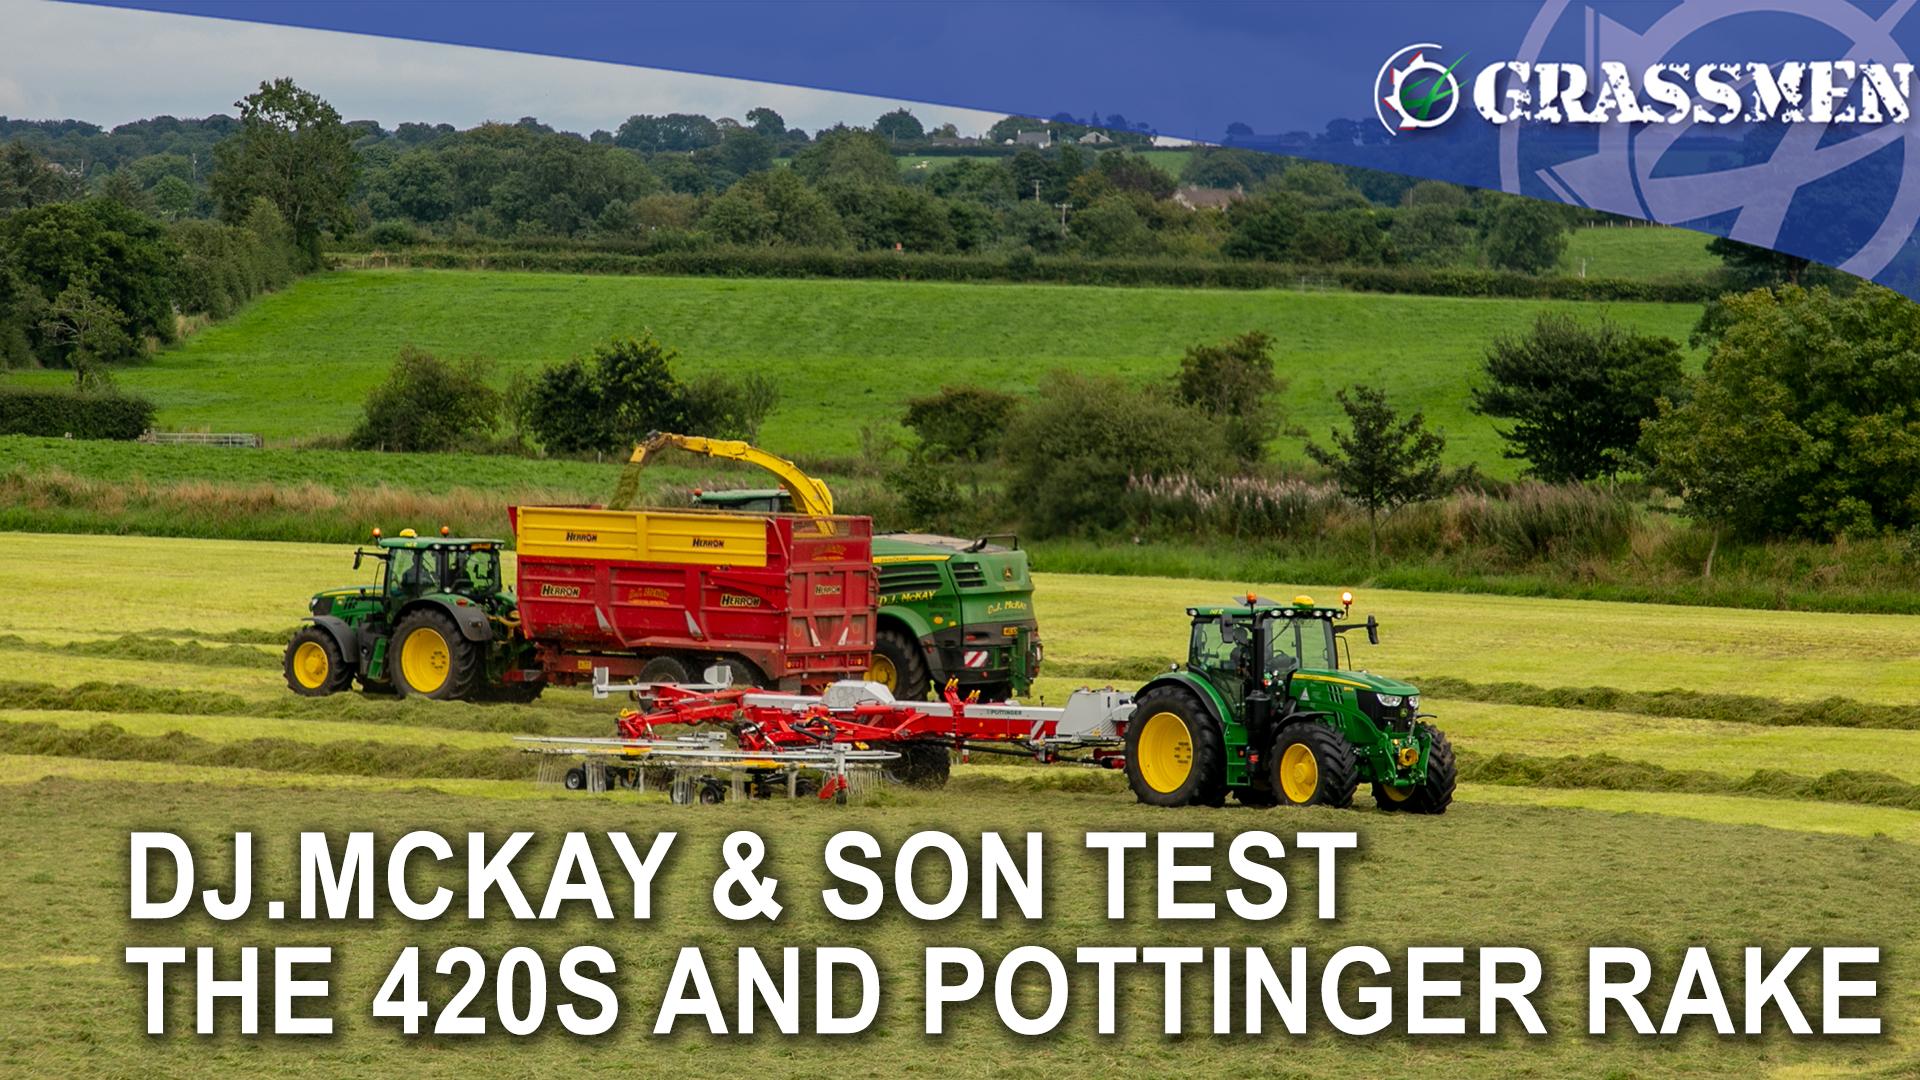 D.J McKay & Son Test The 420S and Pottinger Rake!